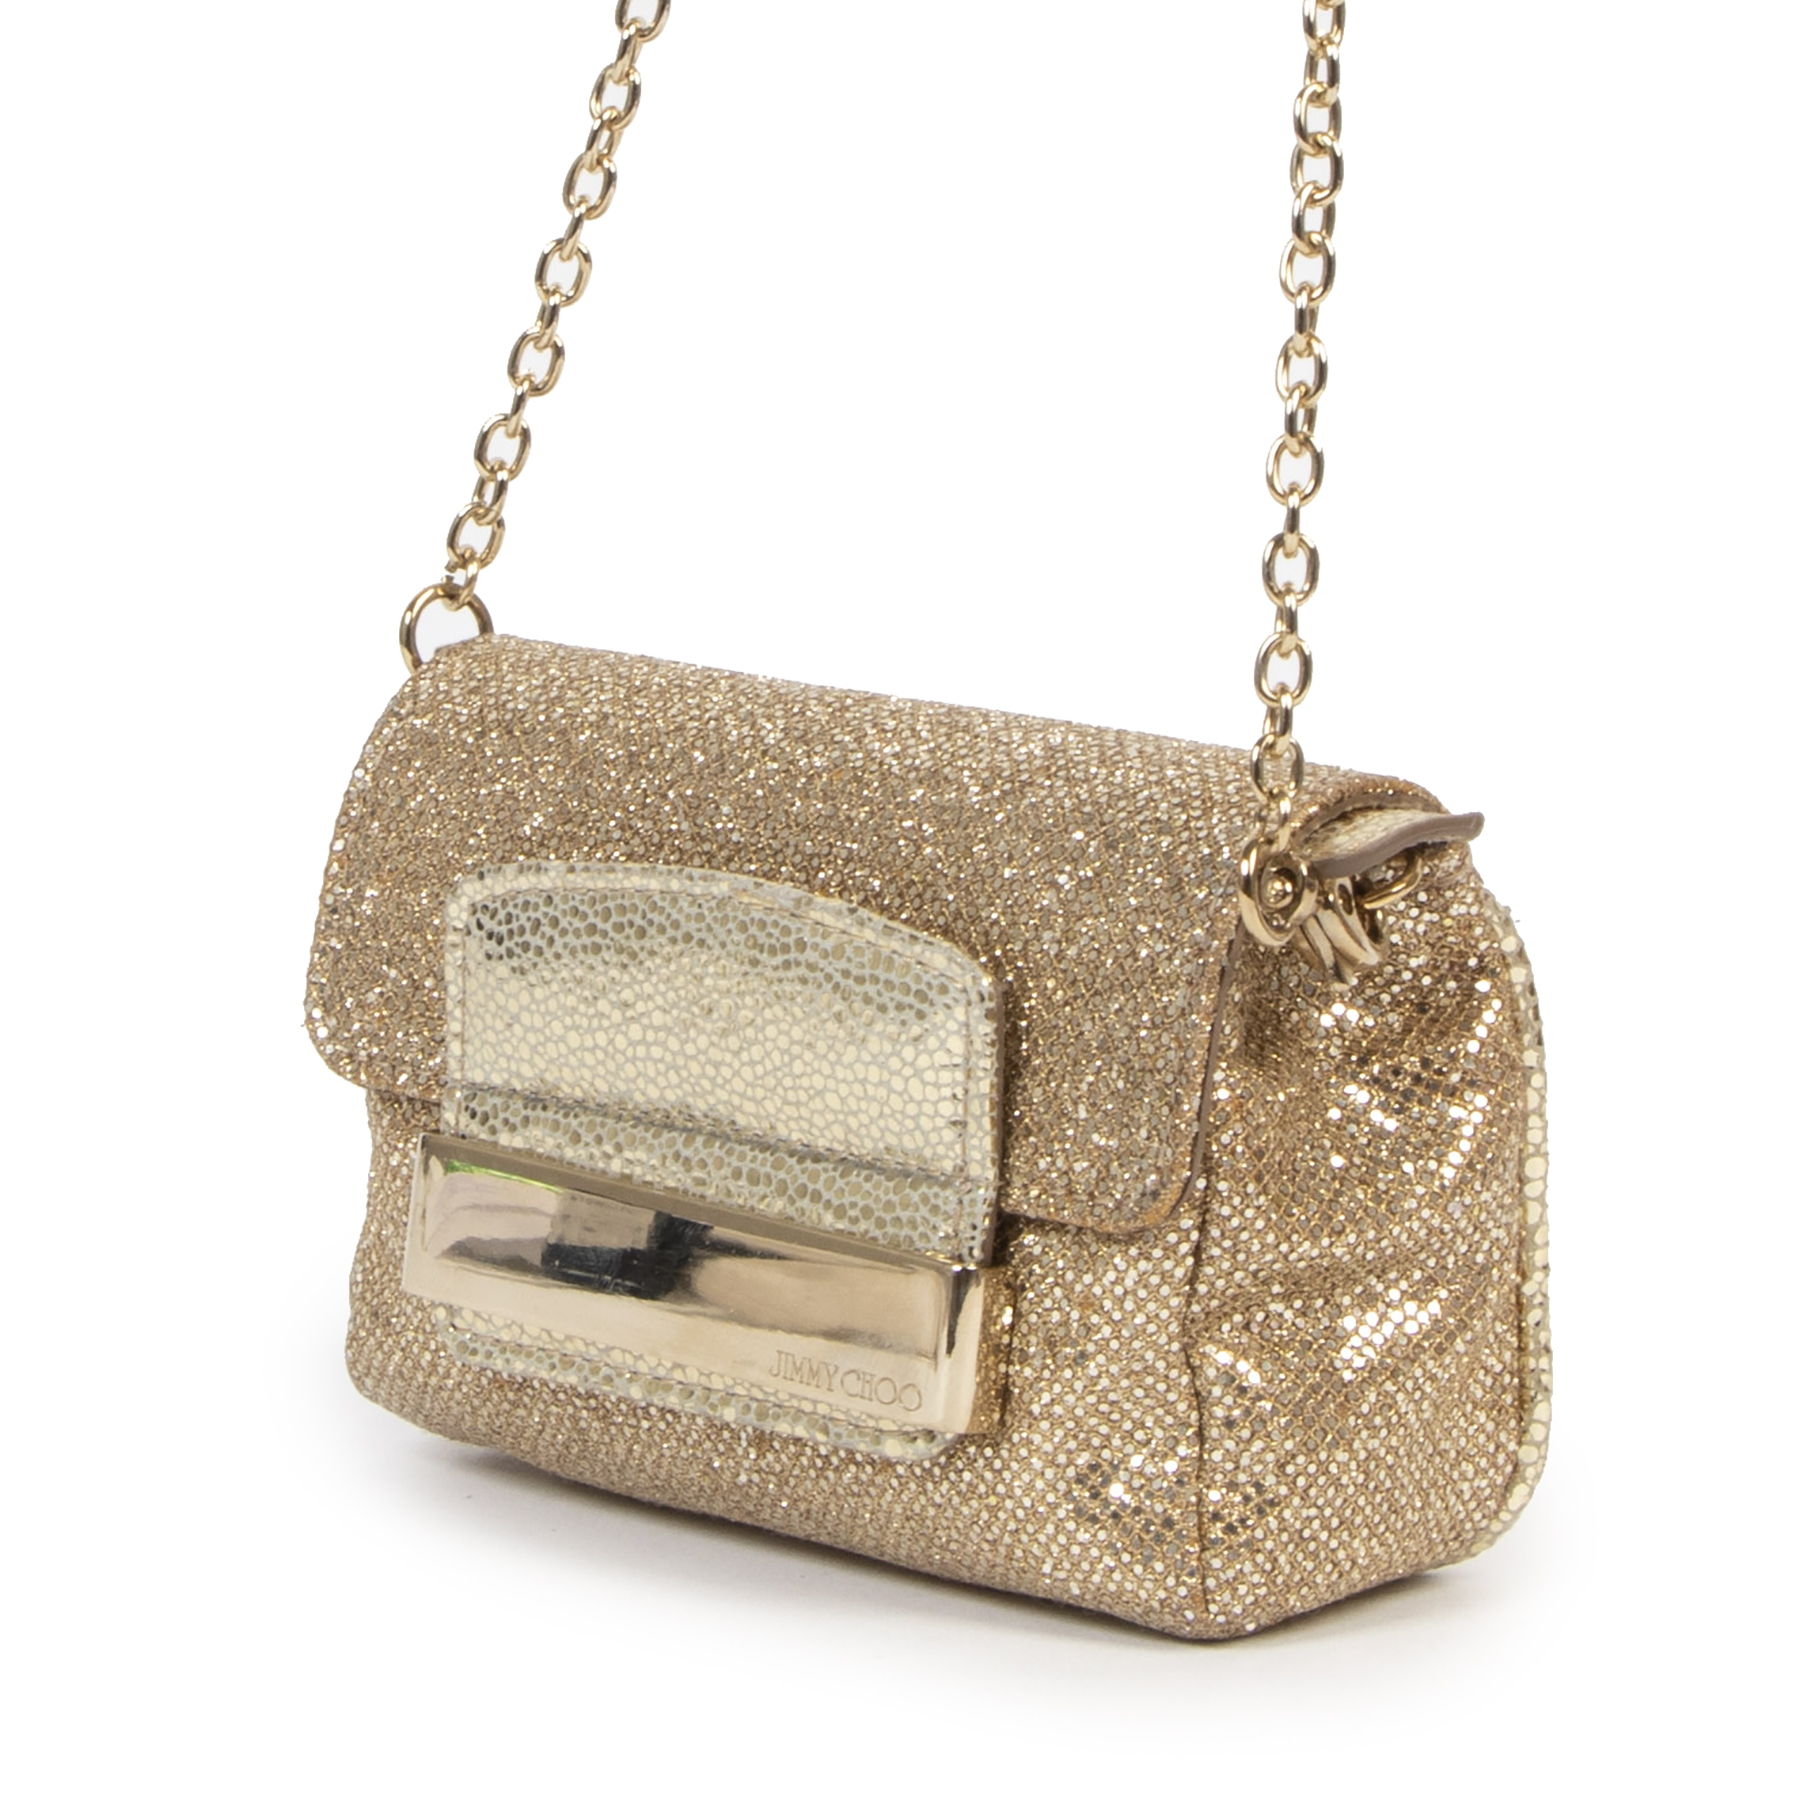 Authentic secondhand Jimmy Choo Gold Rebel Glitter Mini Bag designer bags fashion luxury vintage webshop safe secure online shopping